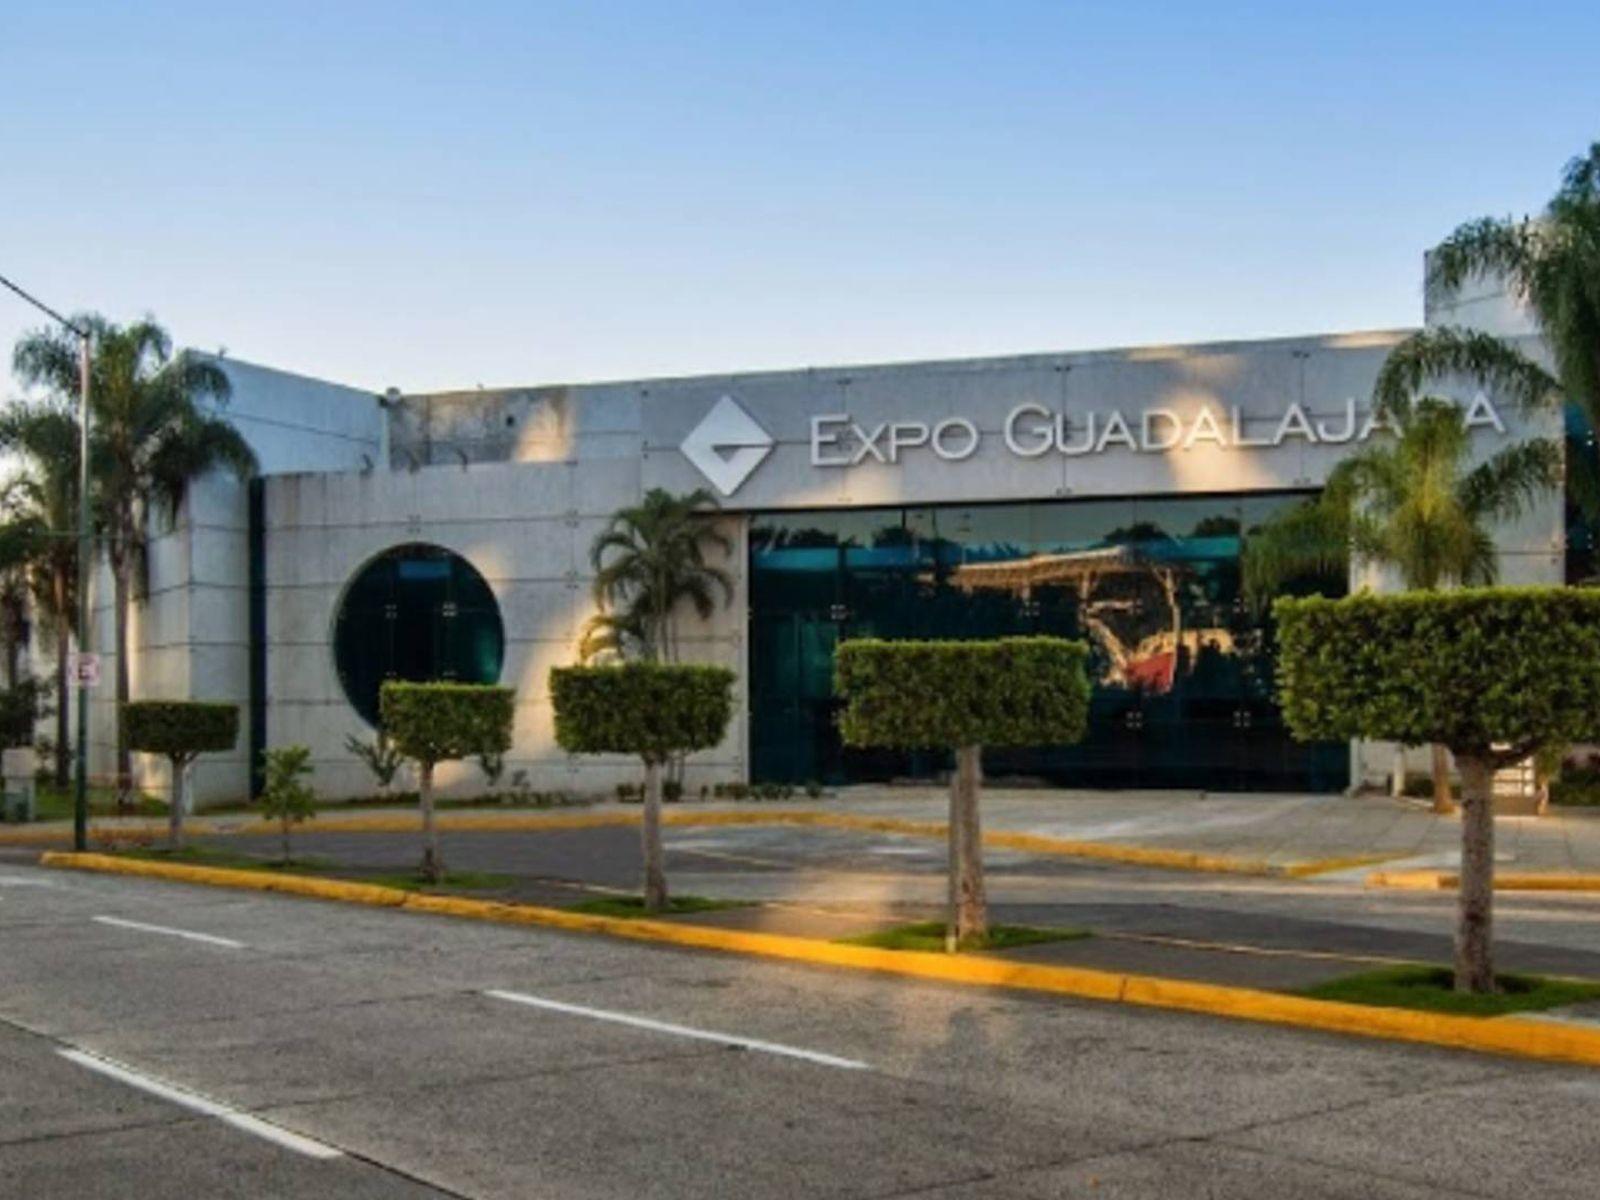 EXPO GUADALAJARA A 27 MIN